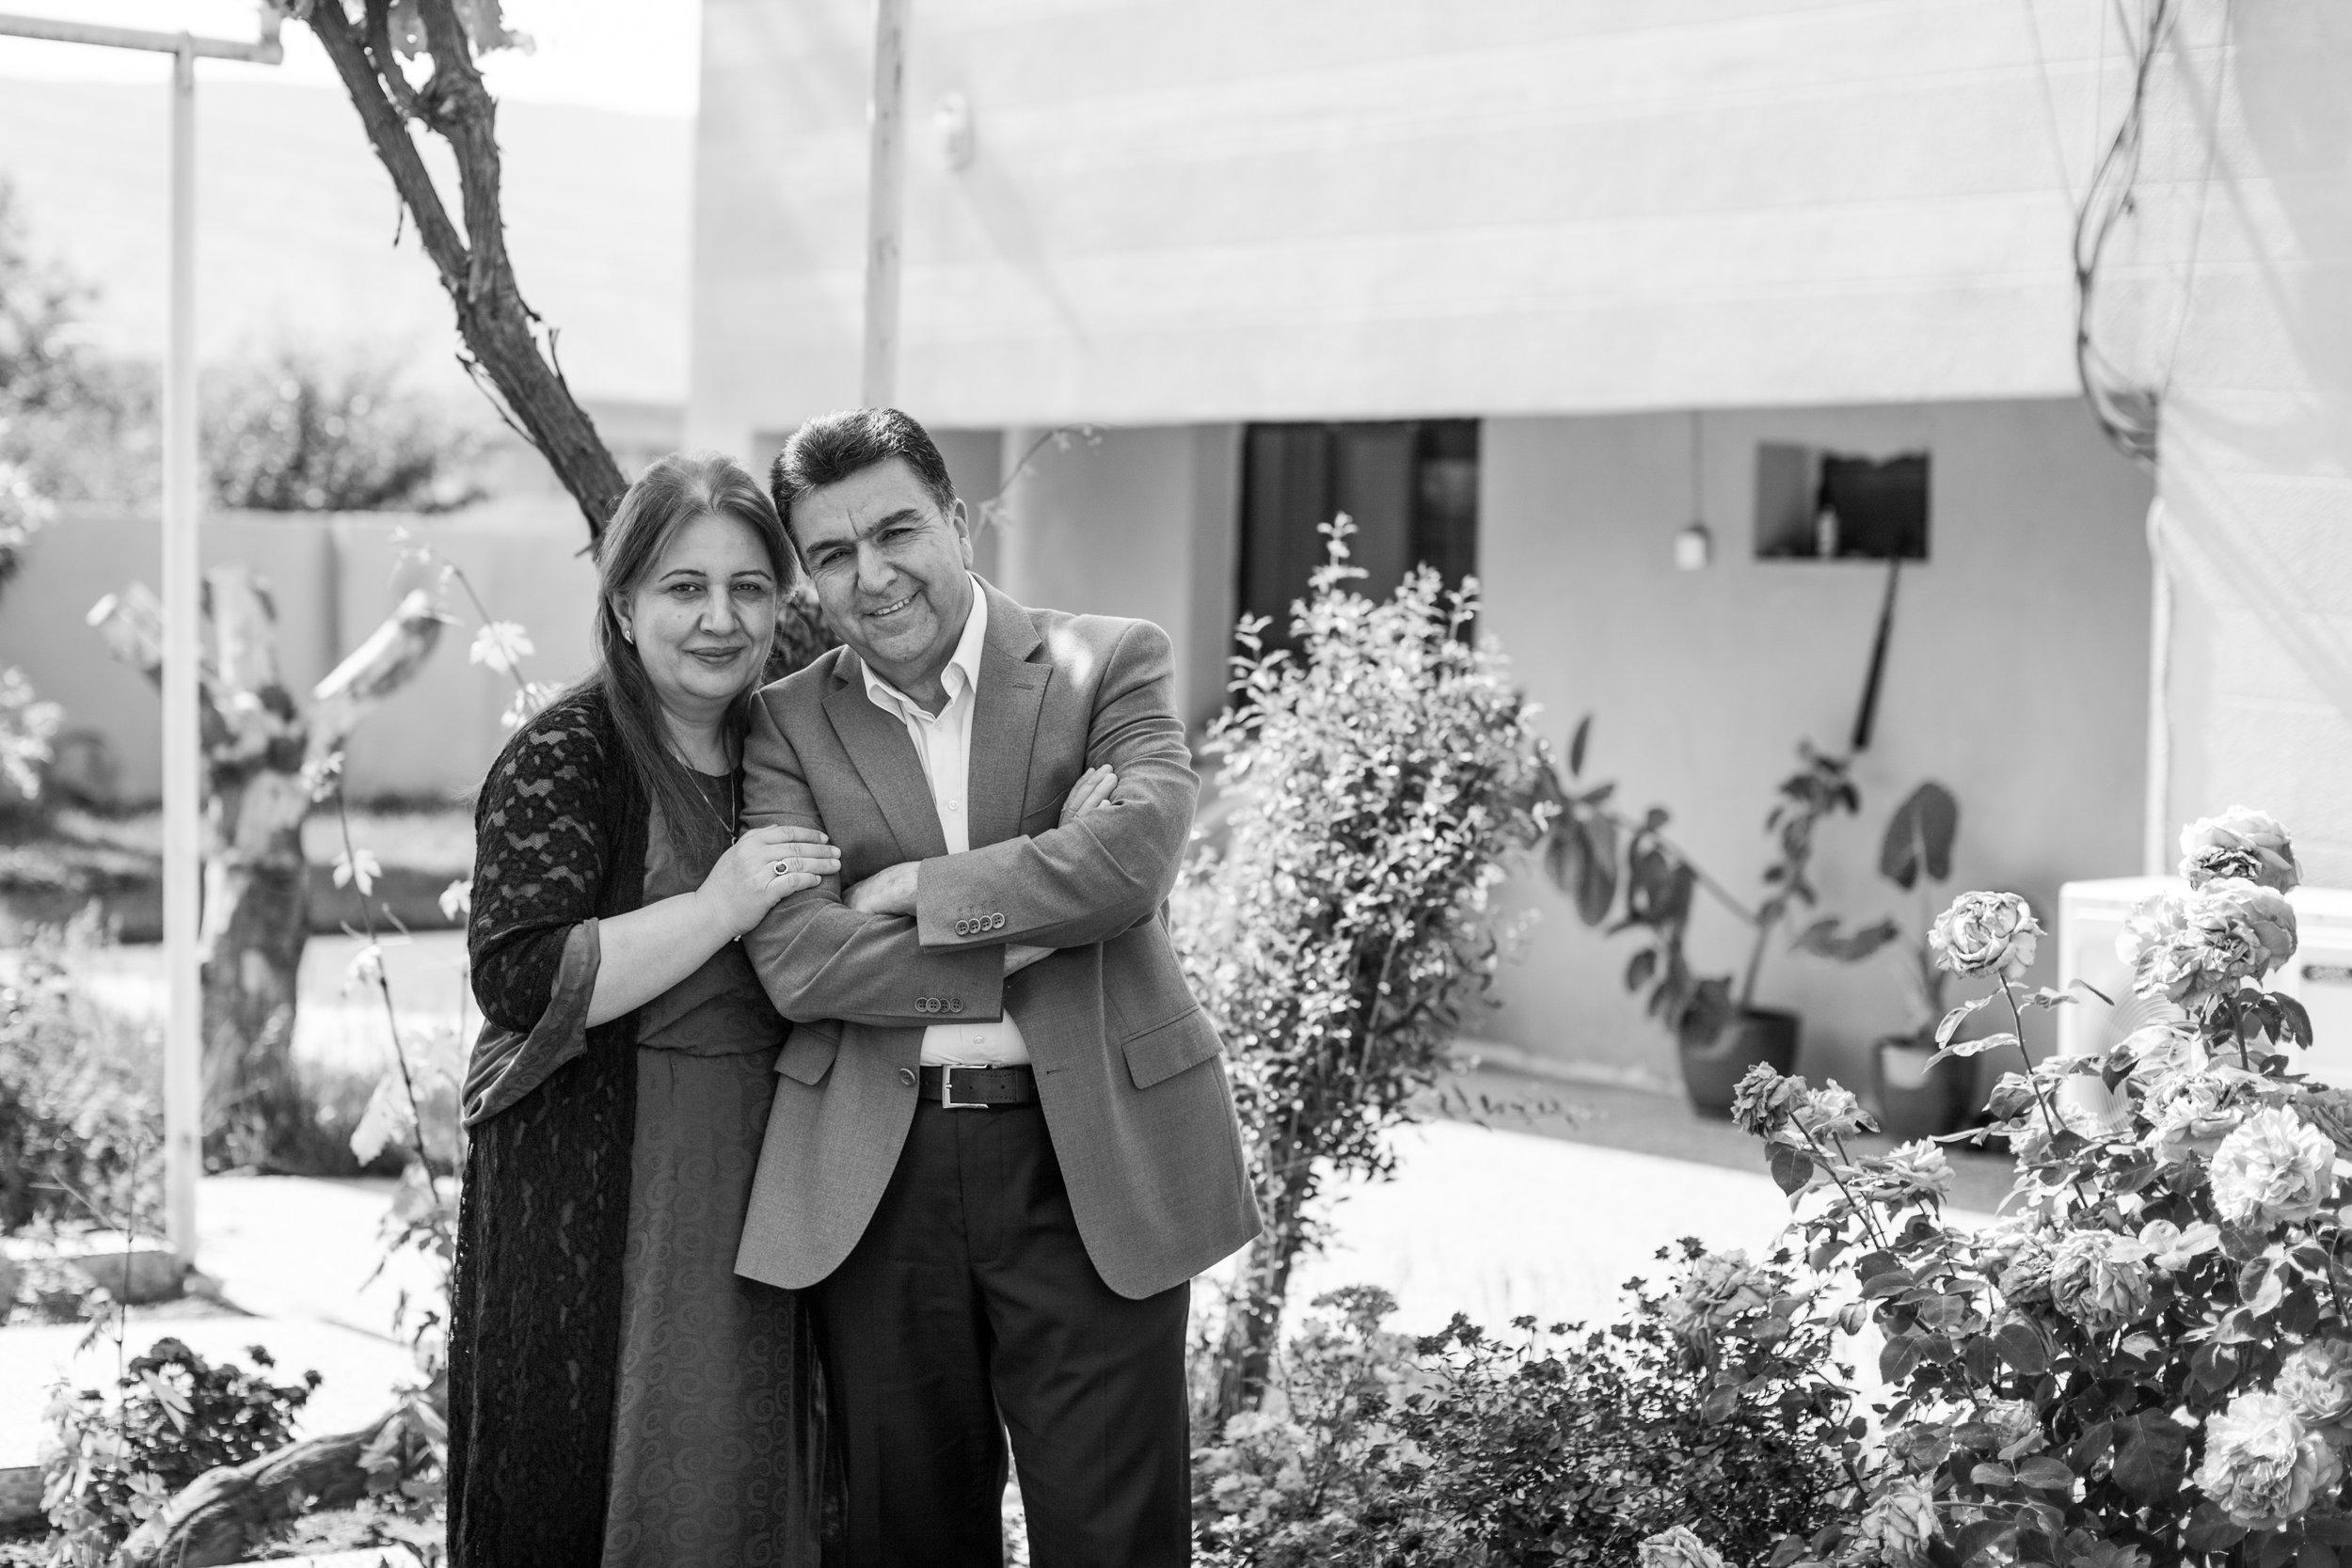 Mayor Krmanj Ezzat Dargali and his wife, Sayran // Photo Credit: Jessie Parks